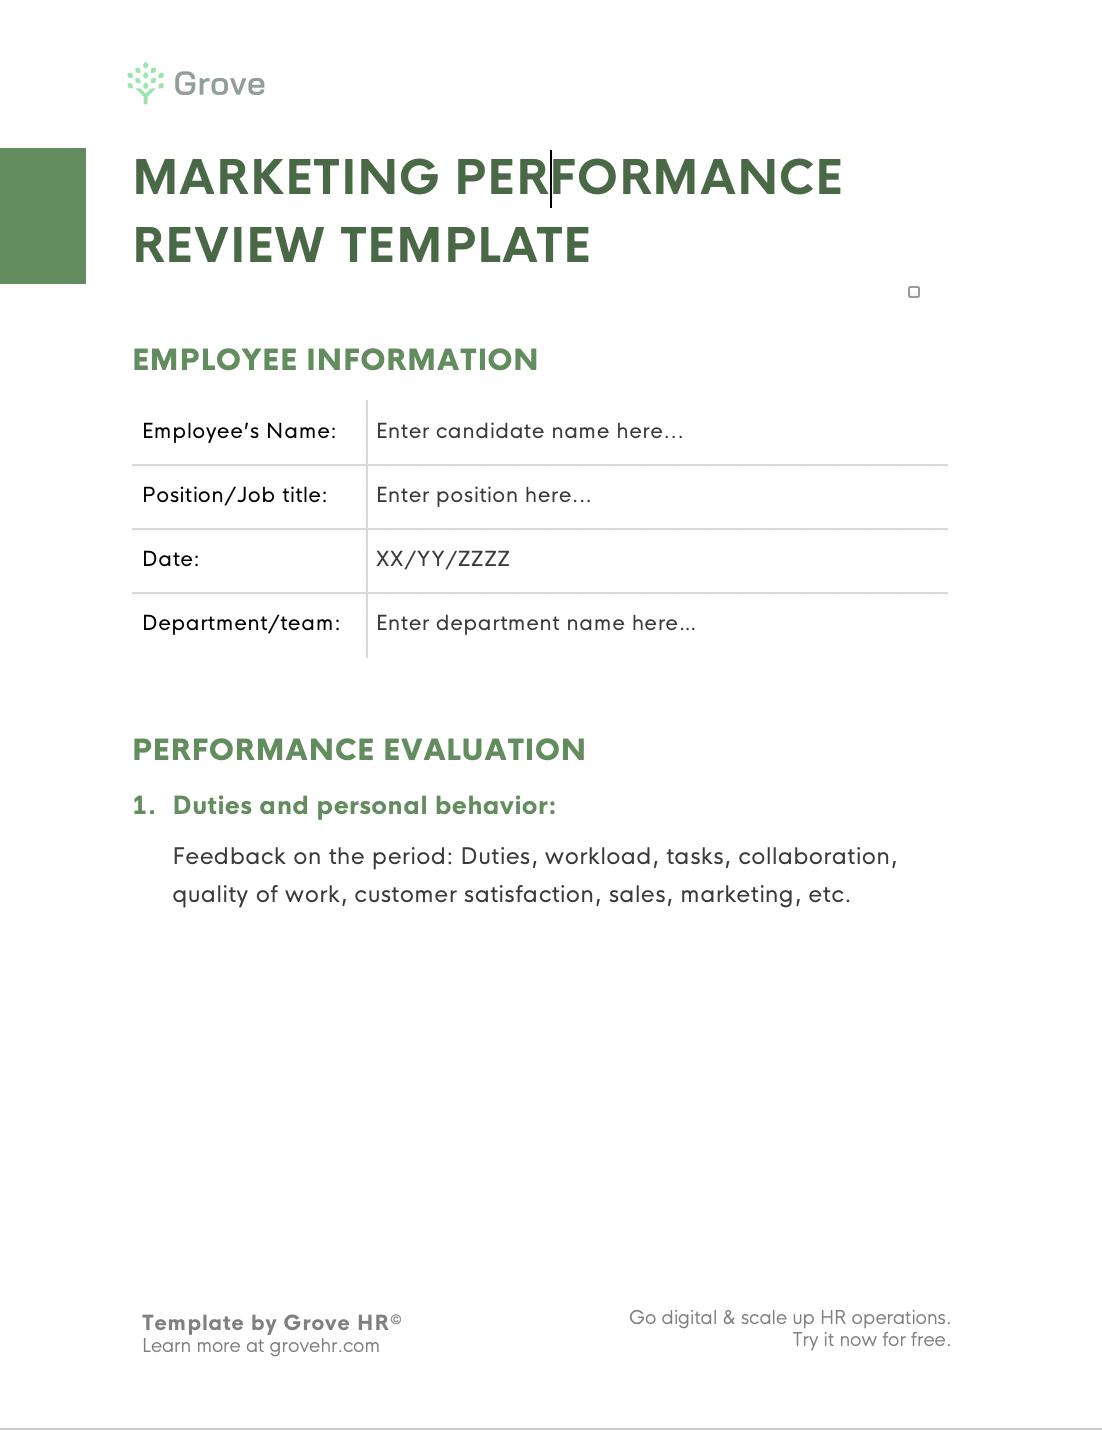 Grove HR - Marketing performance review template slider 2